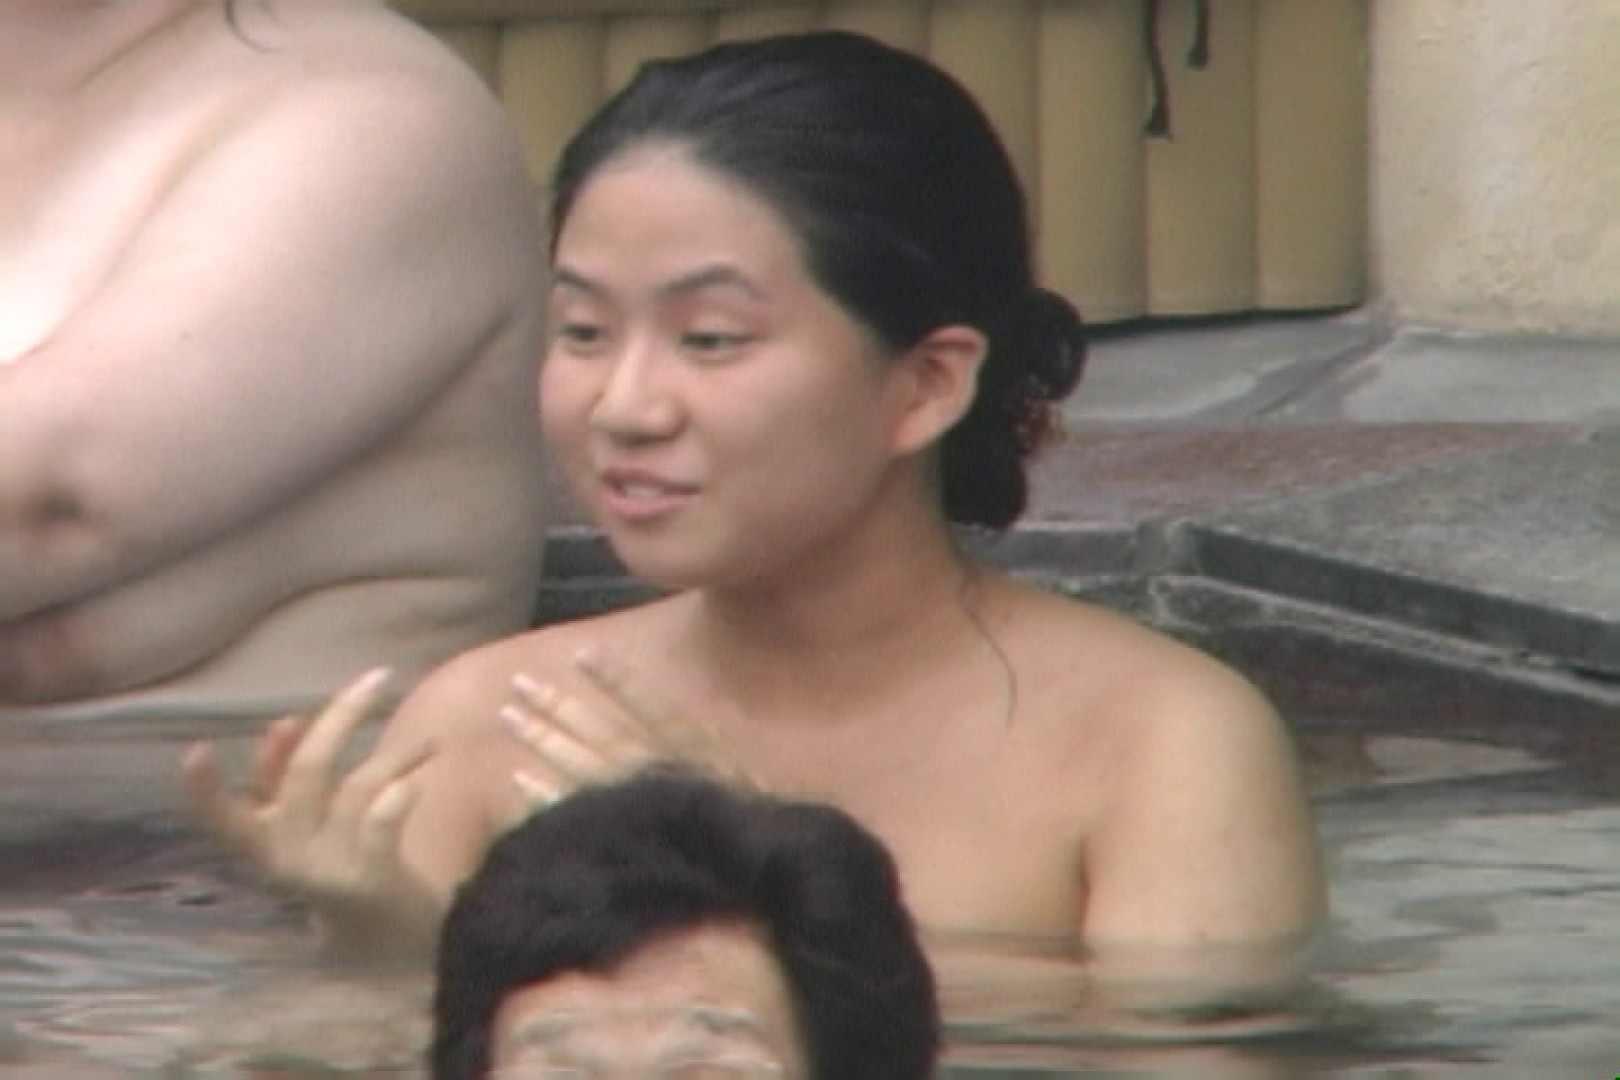 Aquaな露天風呂Vol.43【VIP限定】 盗撮   OLセックス  88画像 22